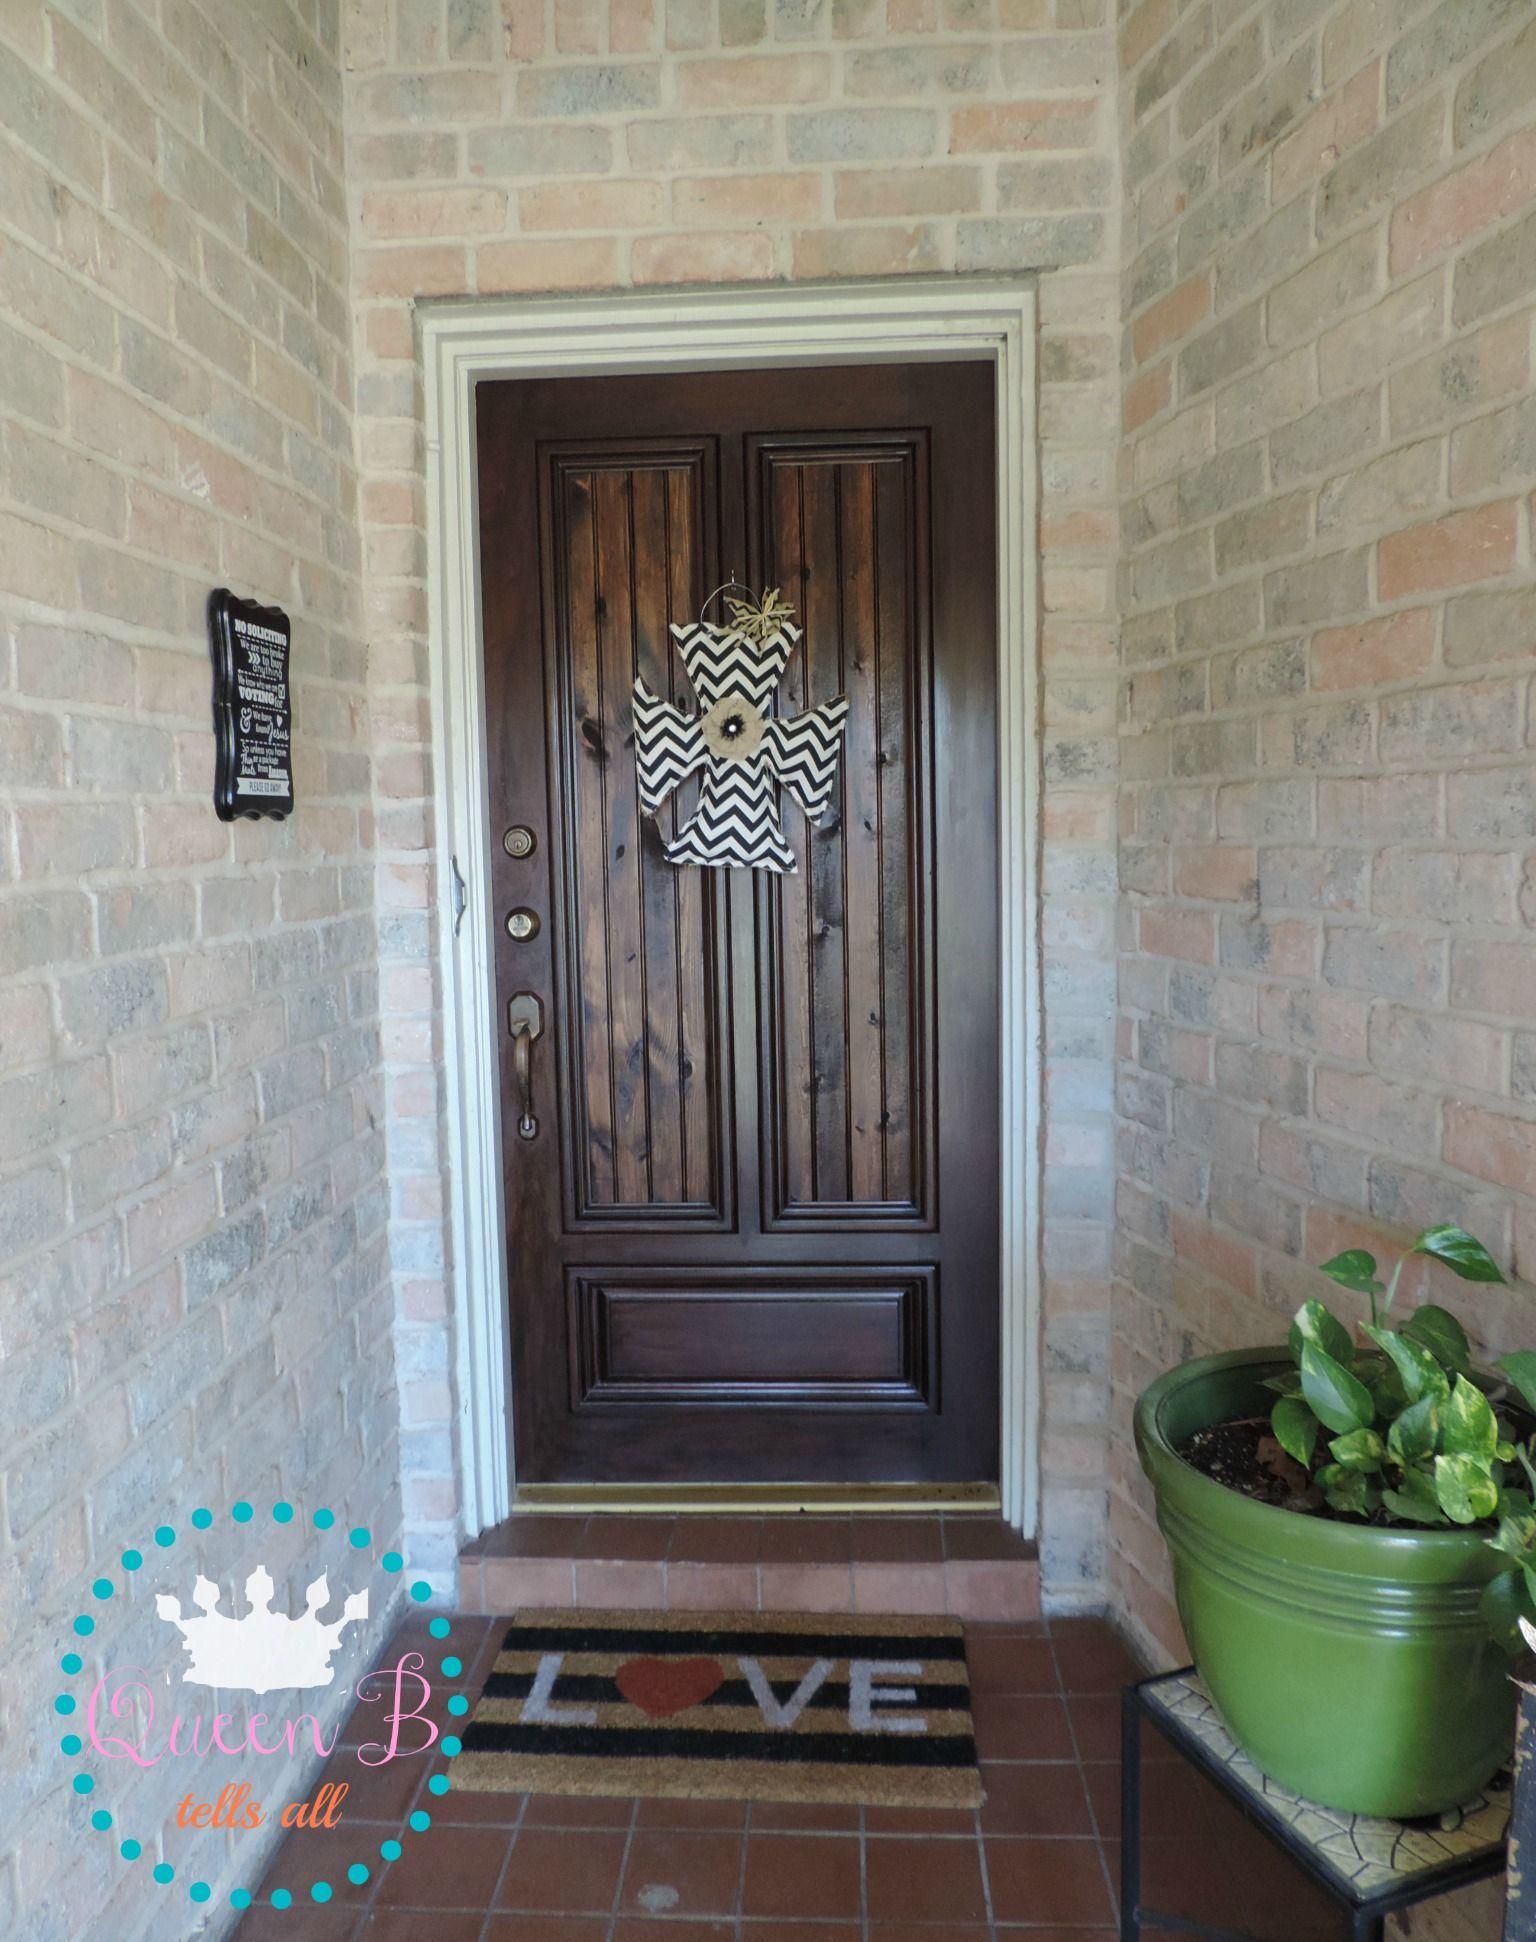 Howtoreplaceglassdoorpanelswithwood frugal decor tips how to replace glass door panels with wood planetlyrics Images